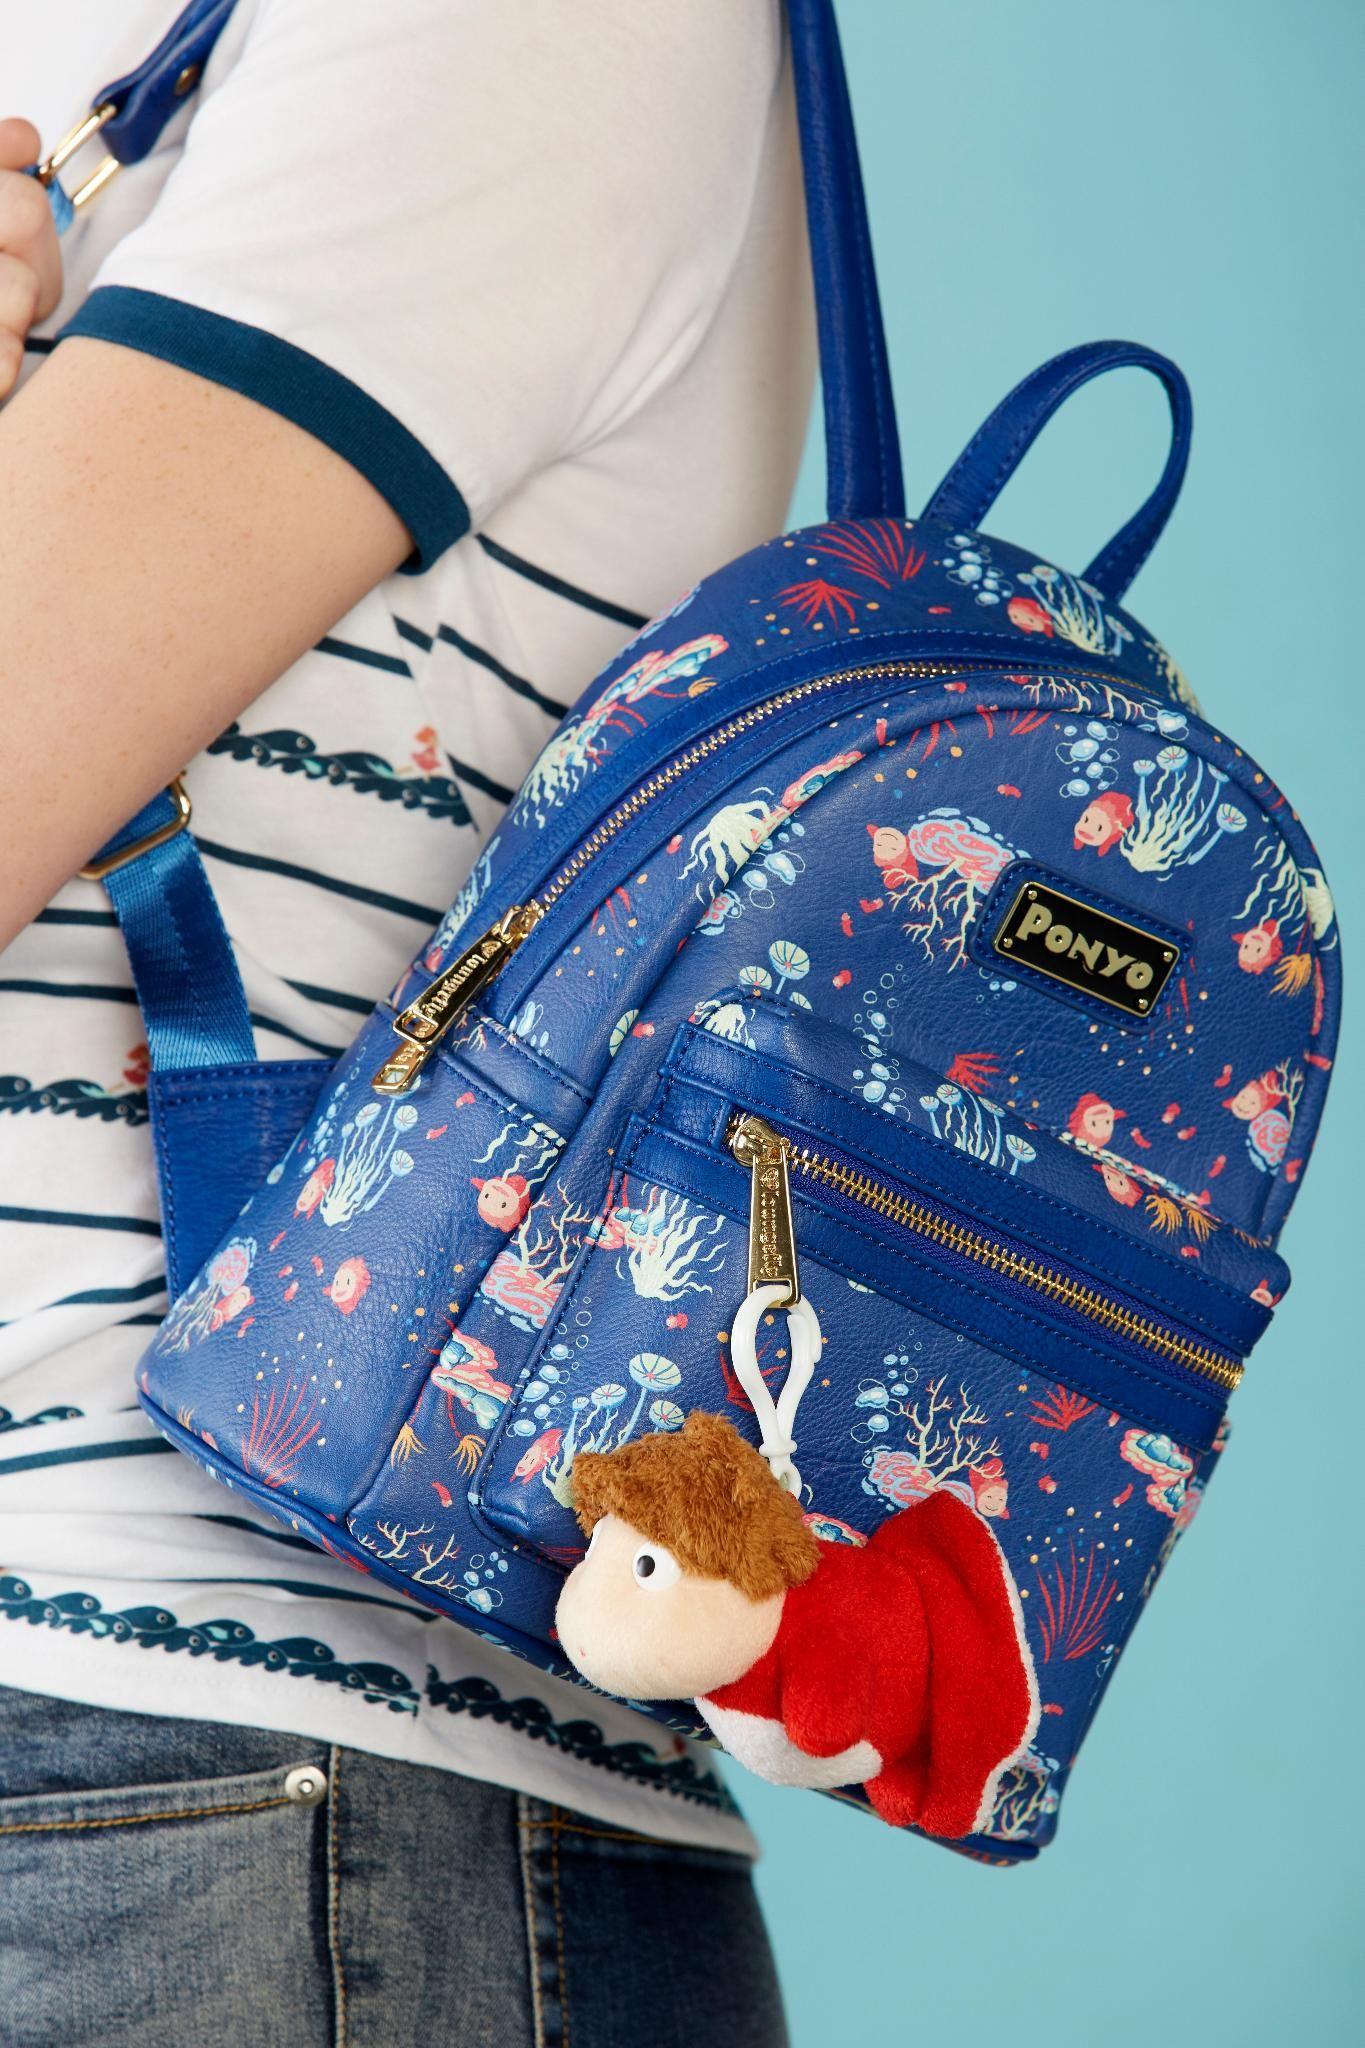 03676b557060 Loungefly Studio Ghibli Ponyo Mini Backpack - BoxLunch Exclusive in ...